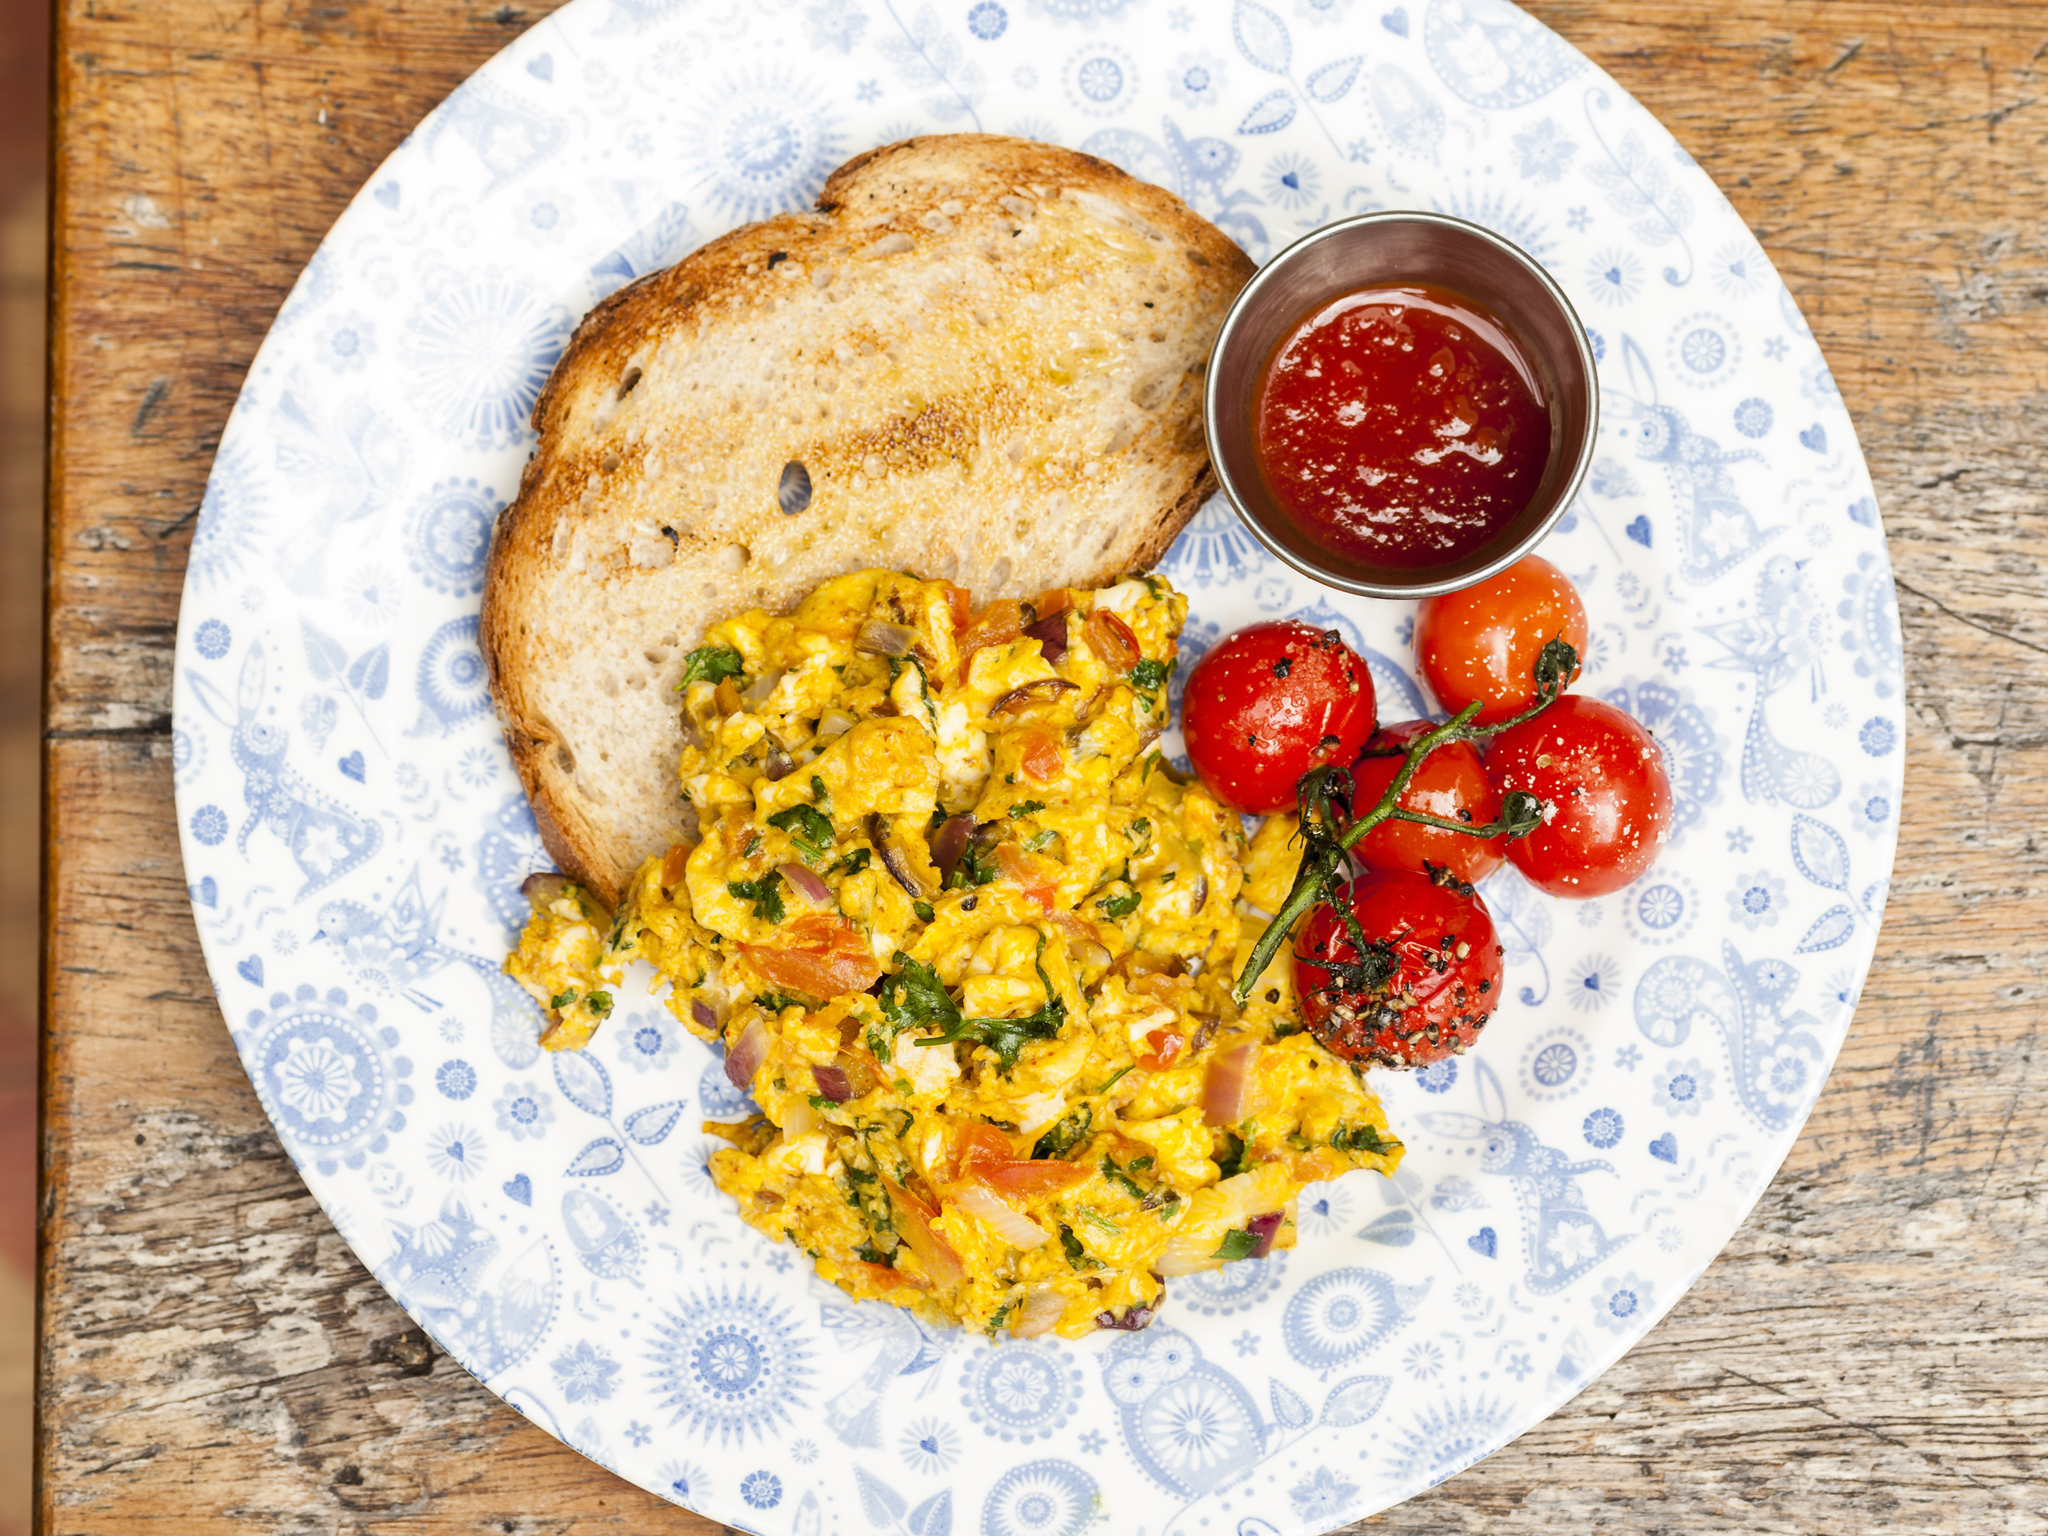 Egg dishes in London, akuri at Dishoom